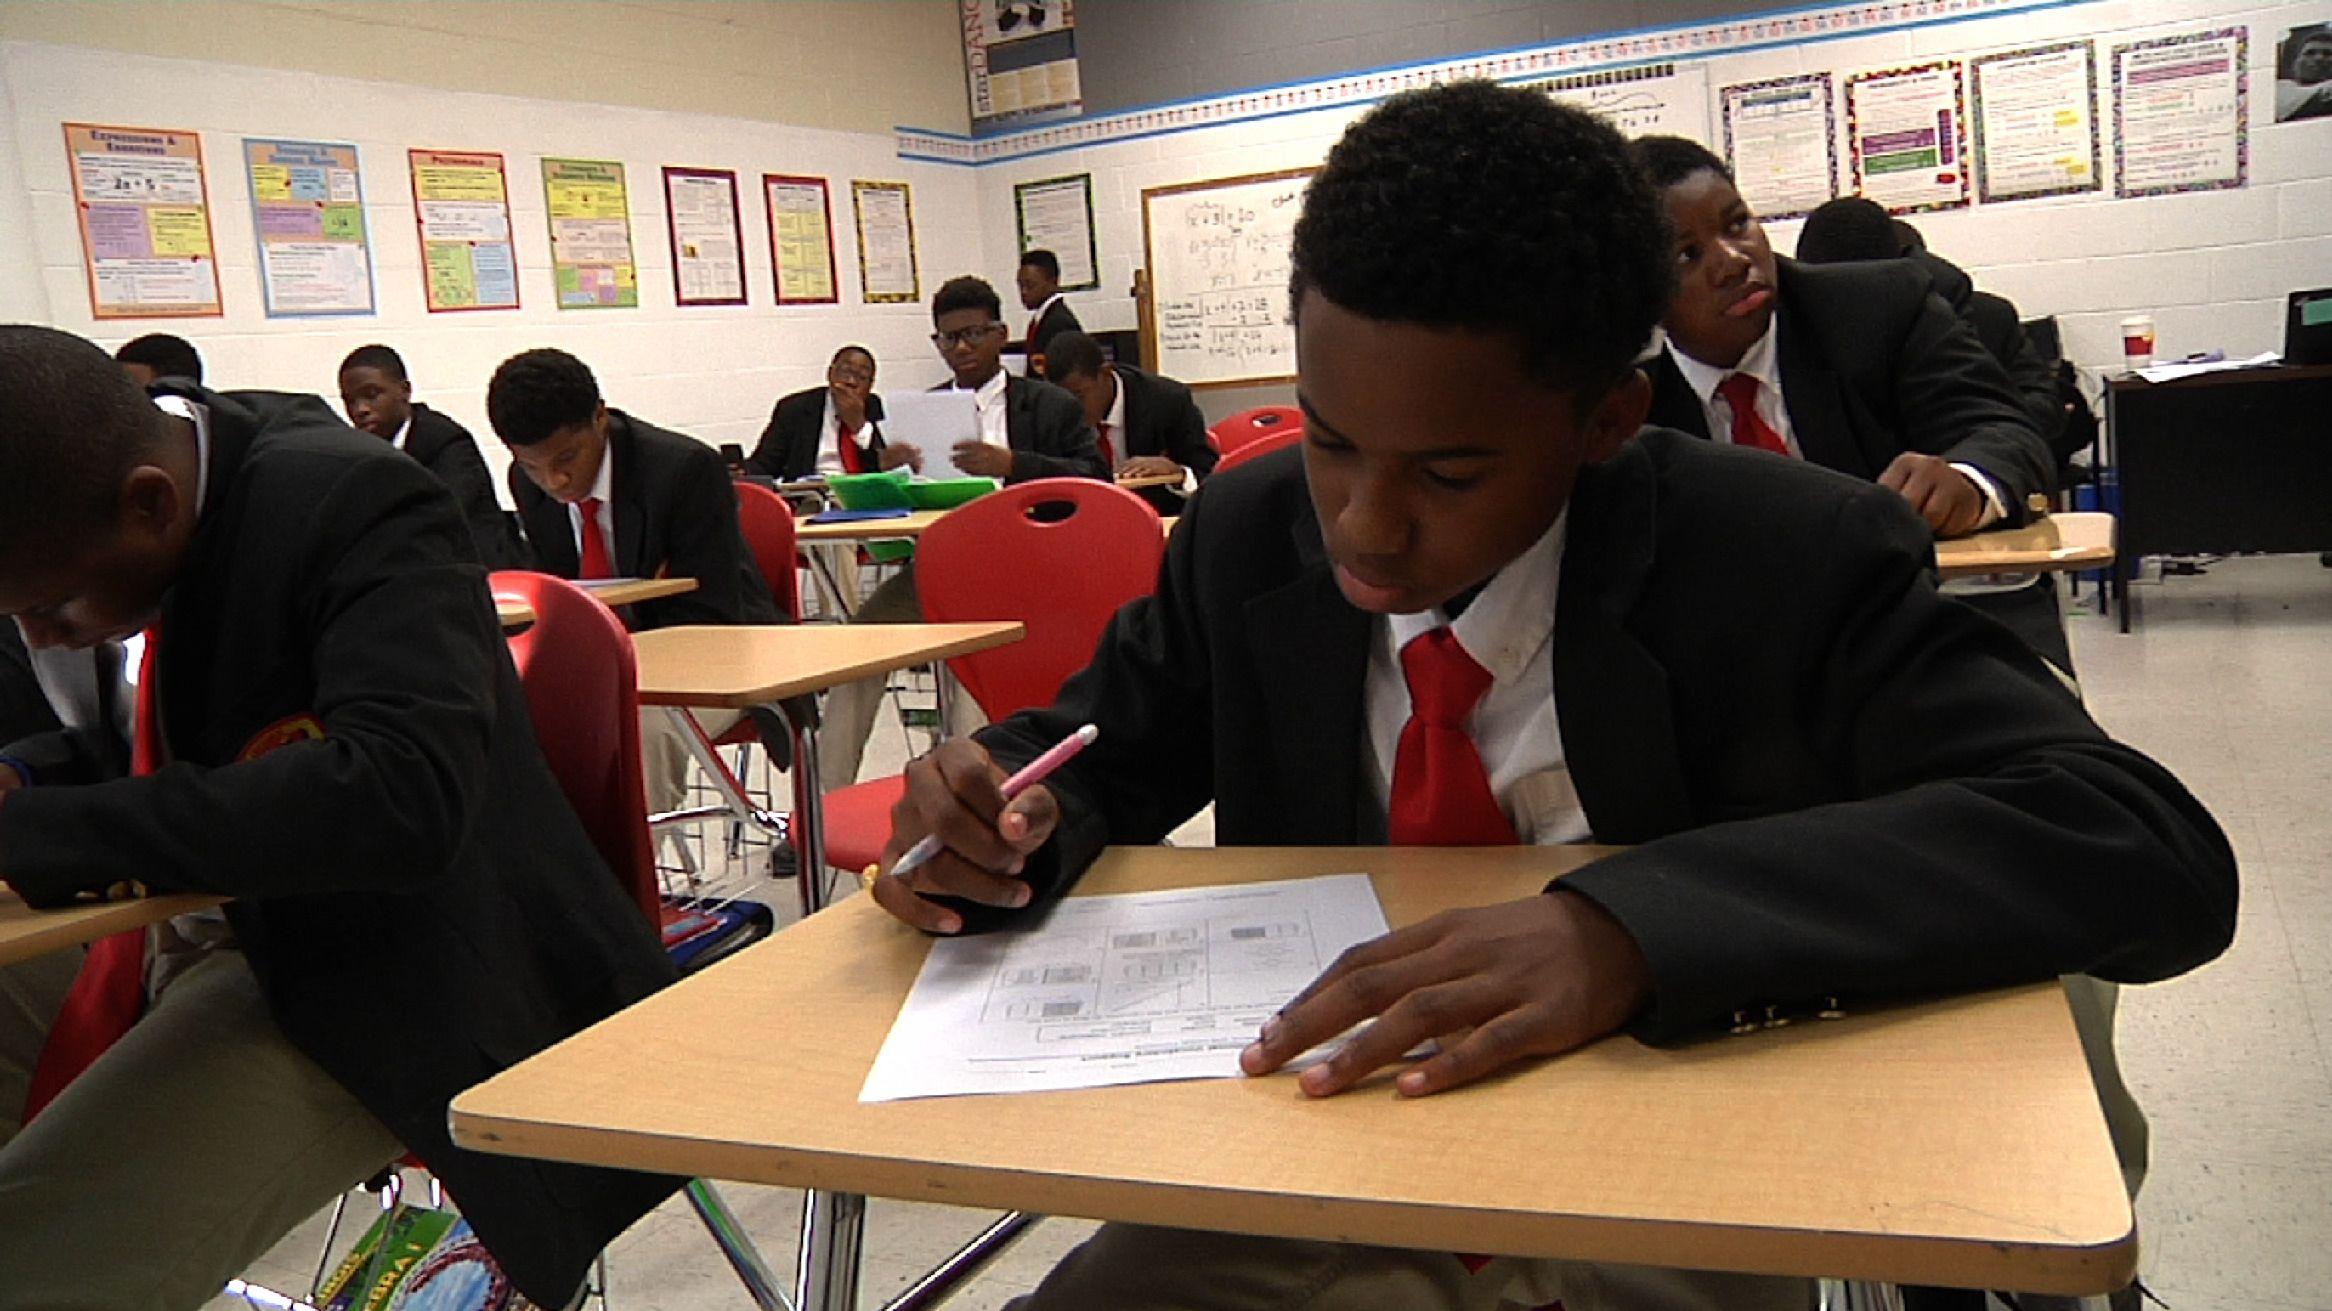 Dissertation school readiness urban public school